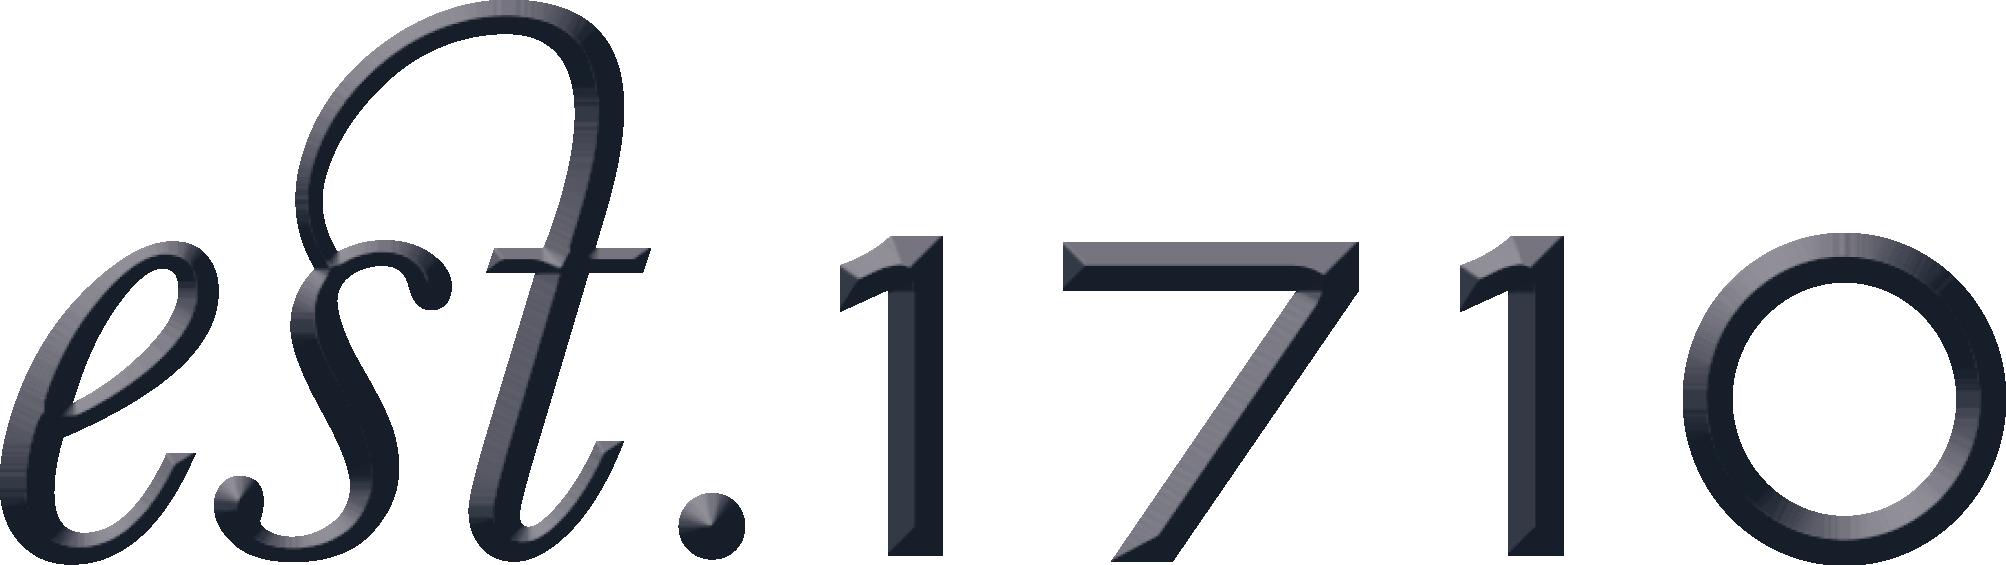 tg-meissen-logo-relief-est